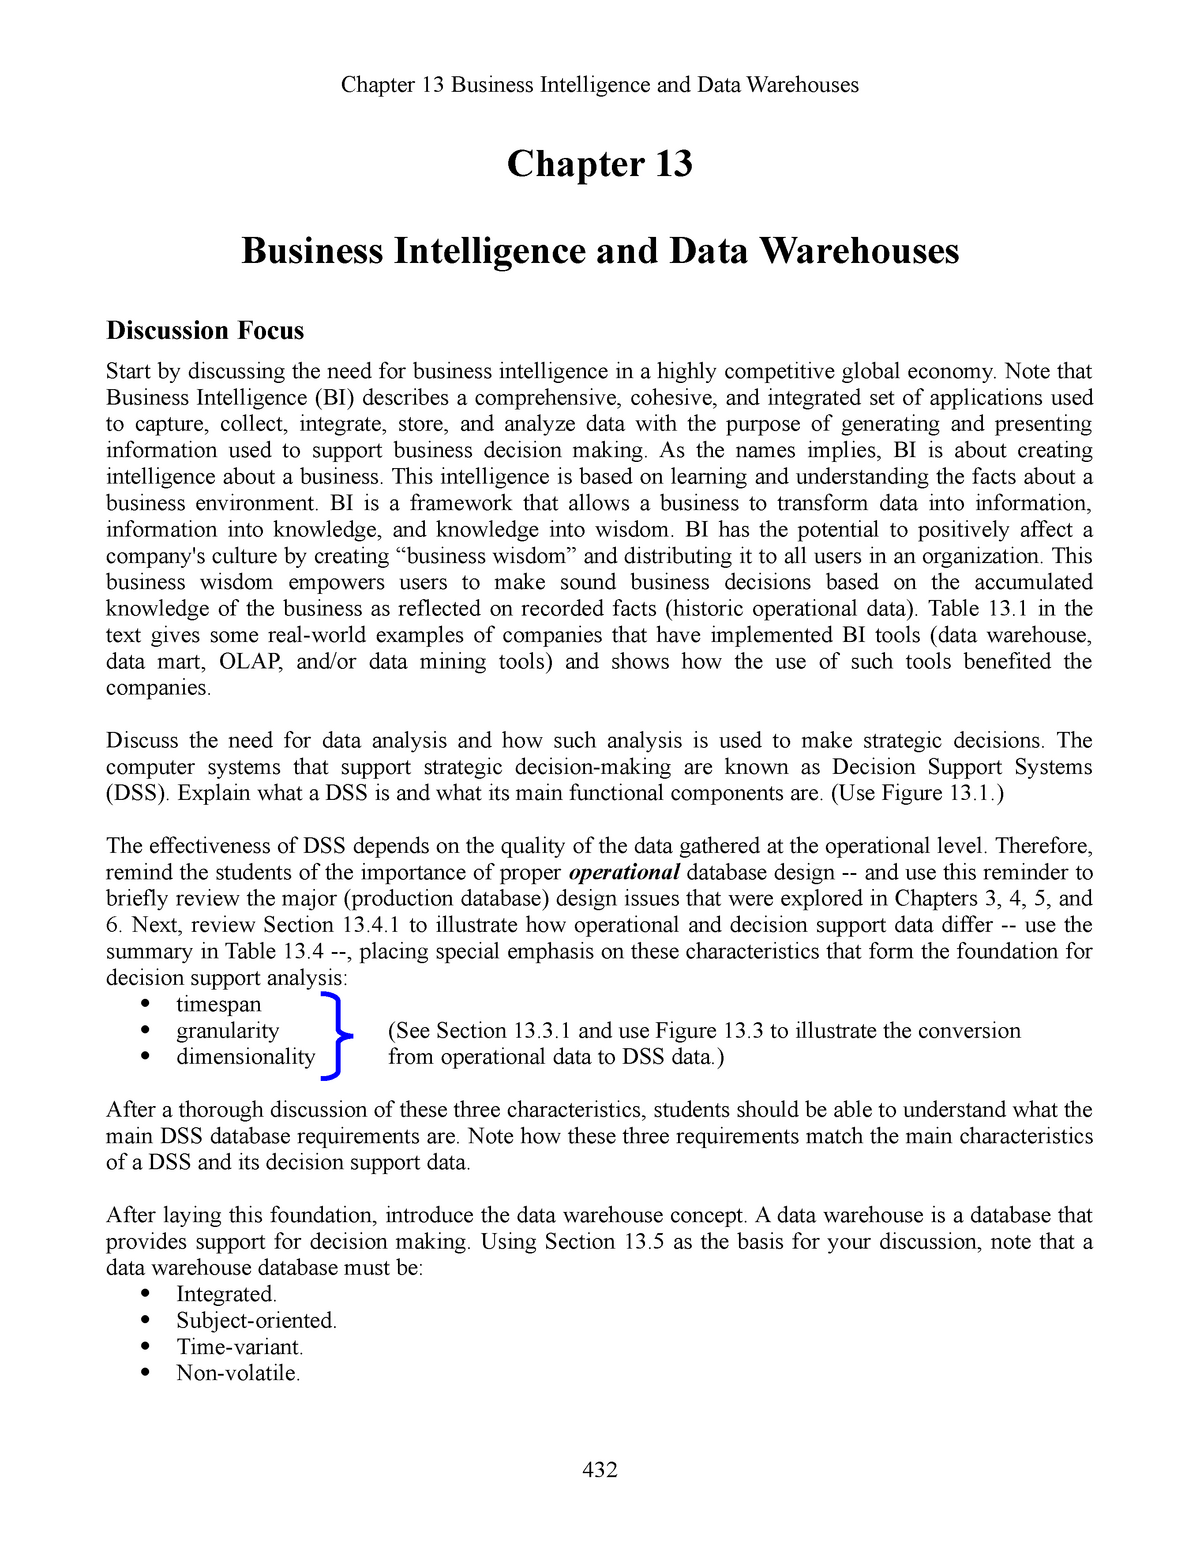 IM Ch13 Data Warehouse Ed12 - ITC423 Database Systems - CSU